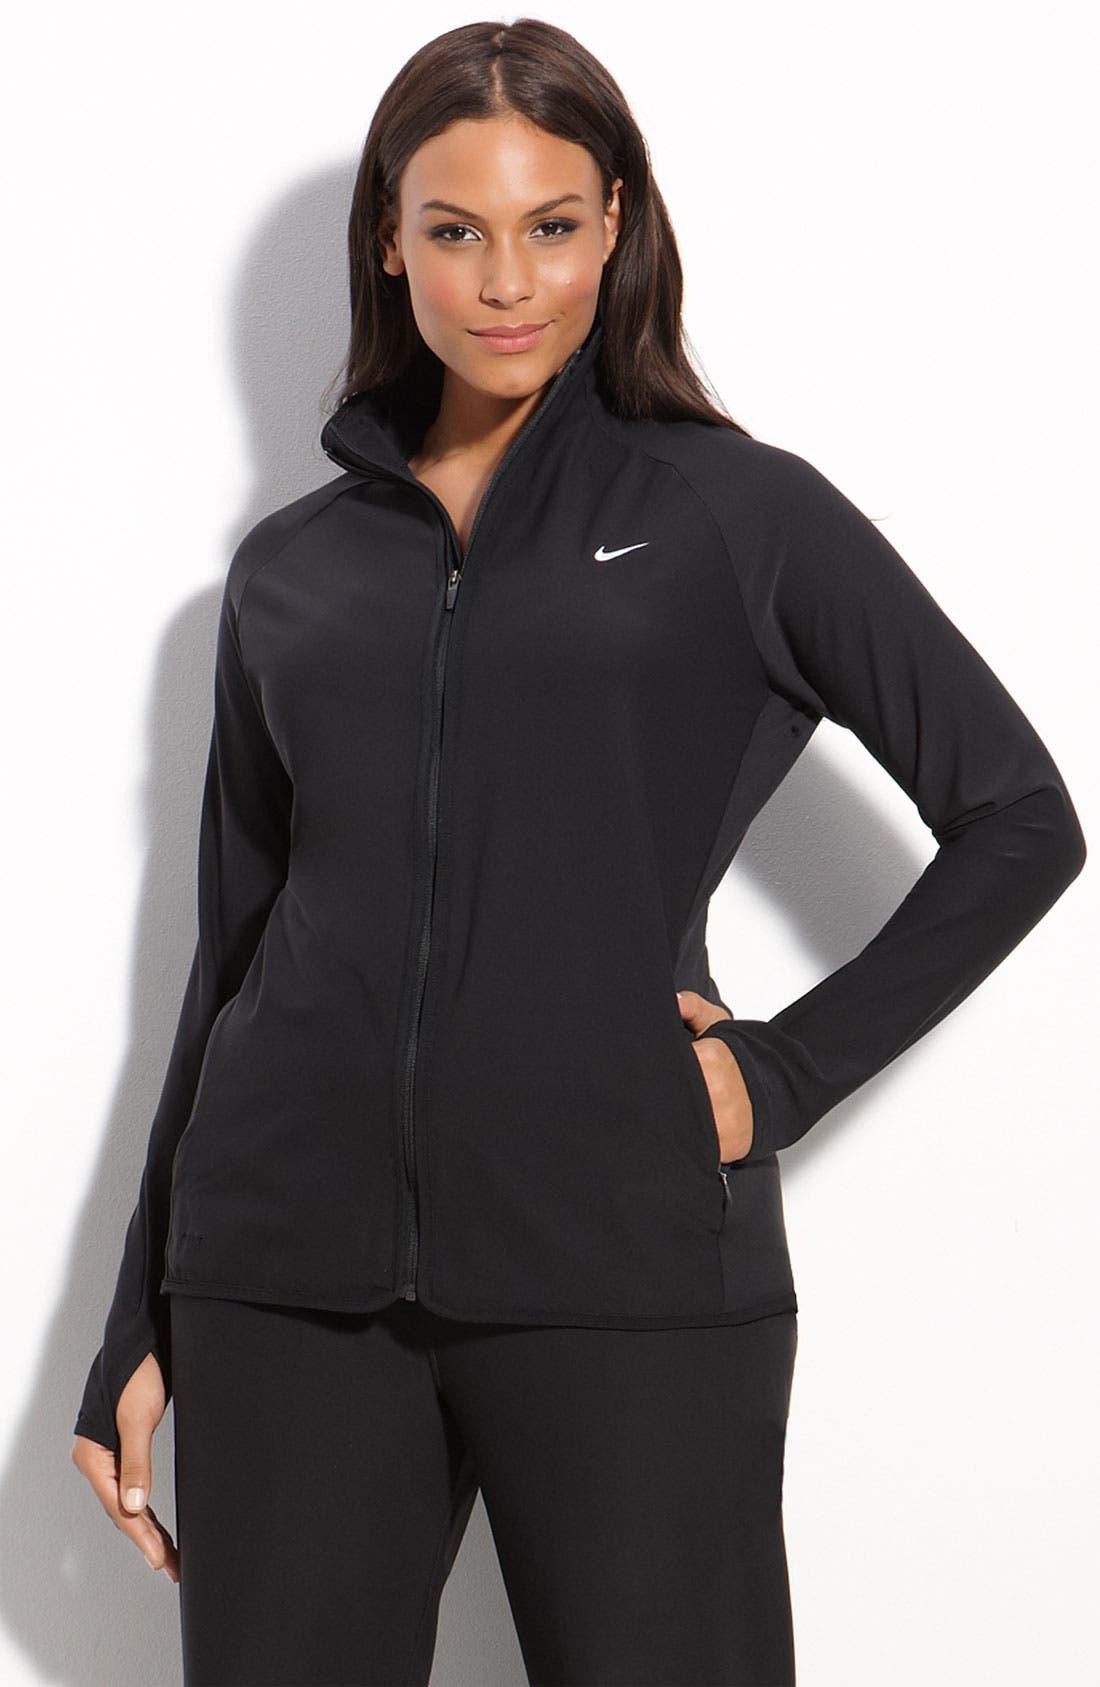 Alternate Image 1 Selected - Nike Zip Front Workout Jacket (Plus)